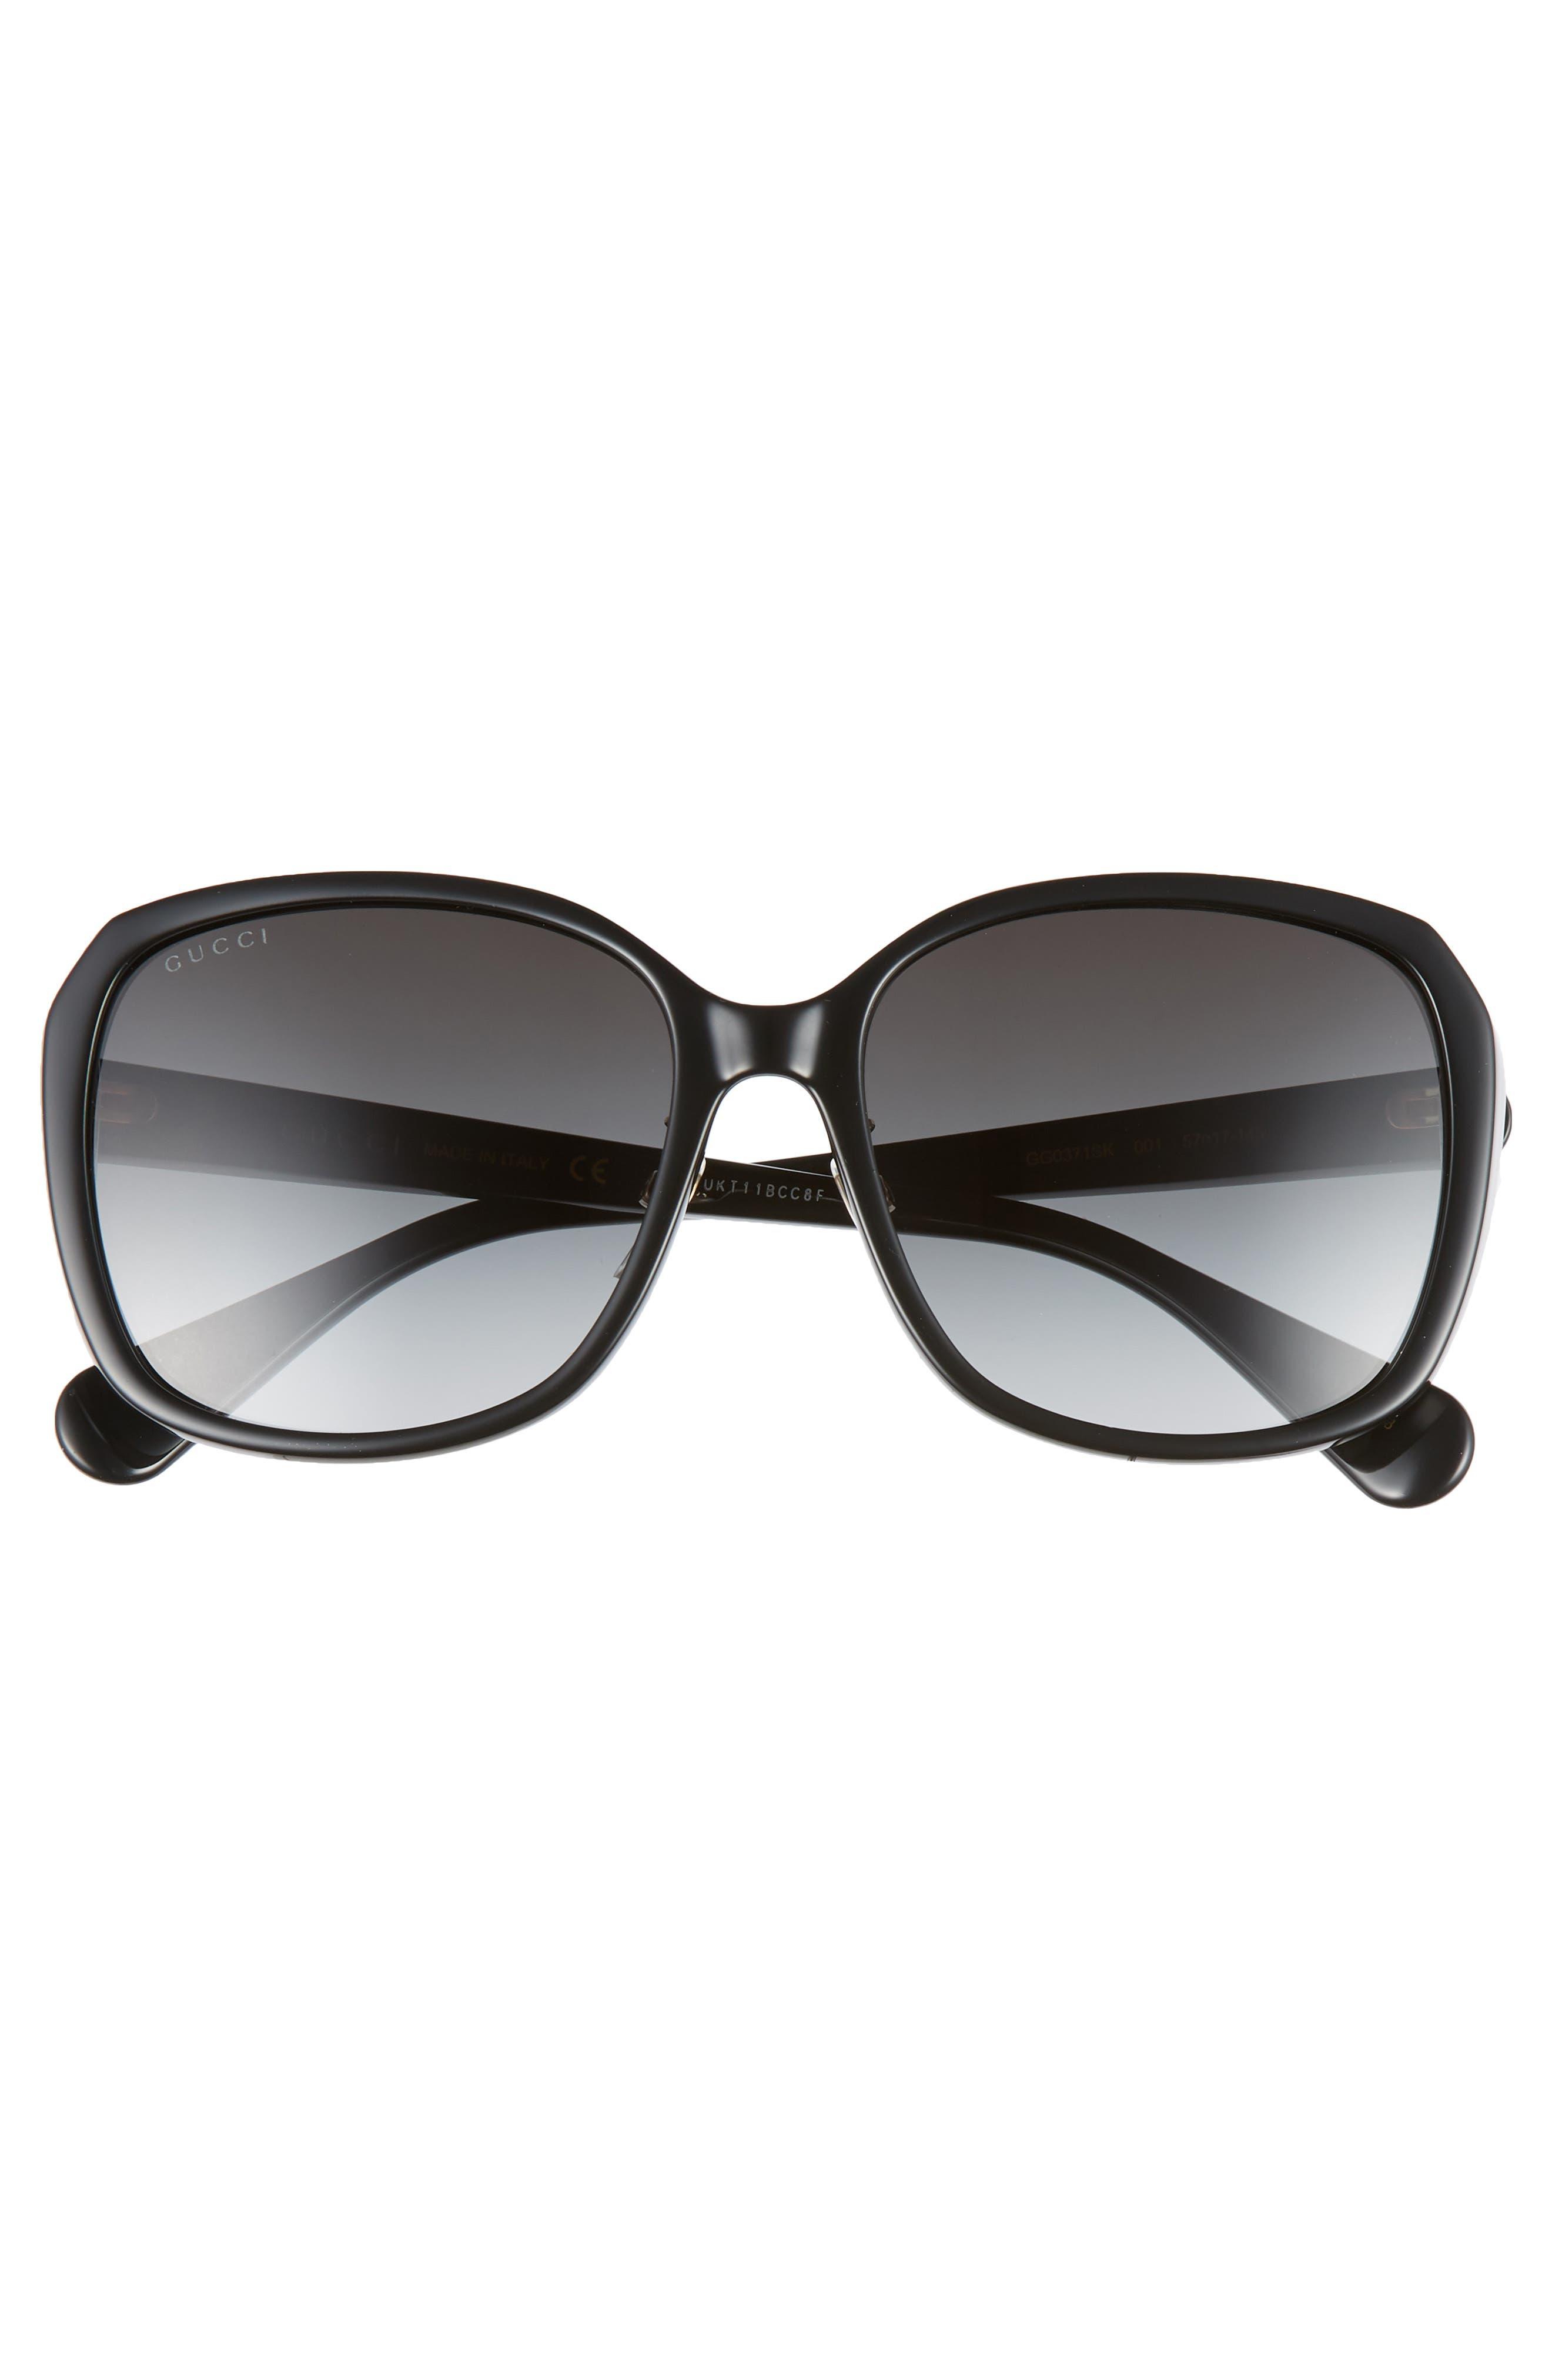 GUCCI, 57mm Square Sunglasses, Alternate thumbnail 3, color, BLACK